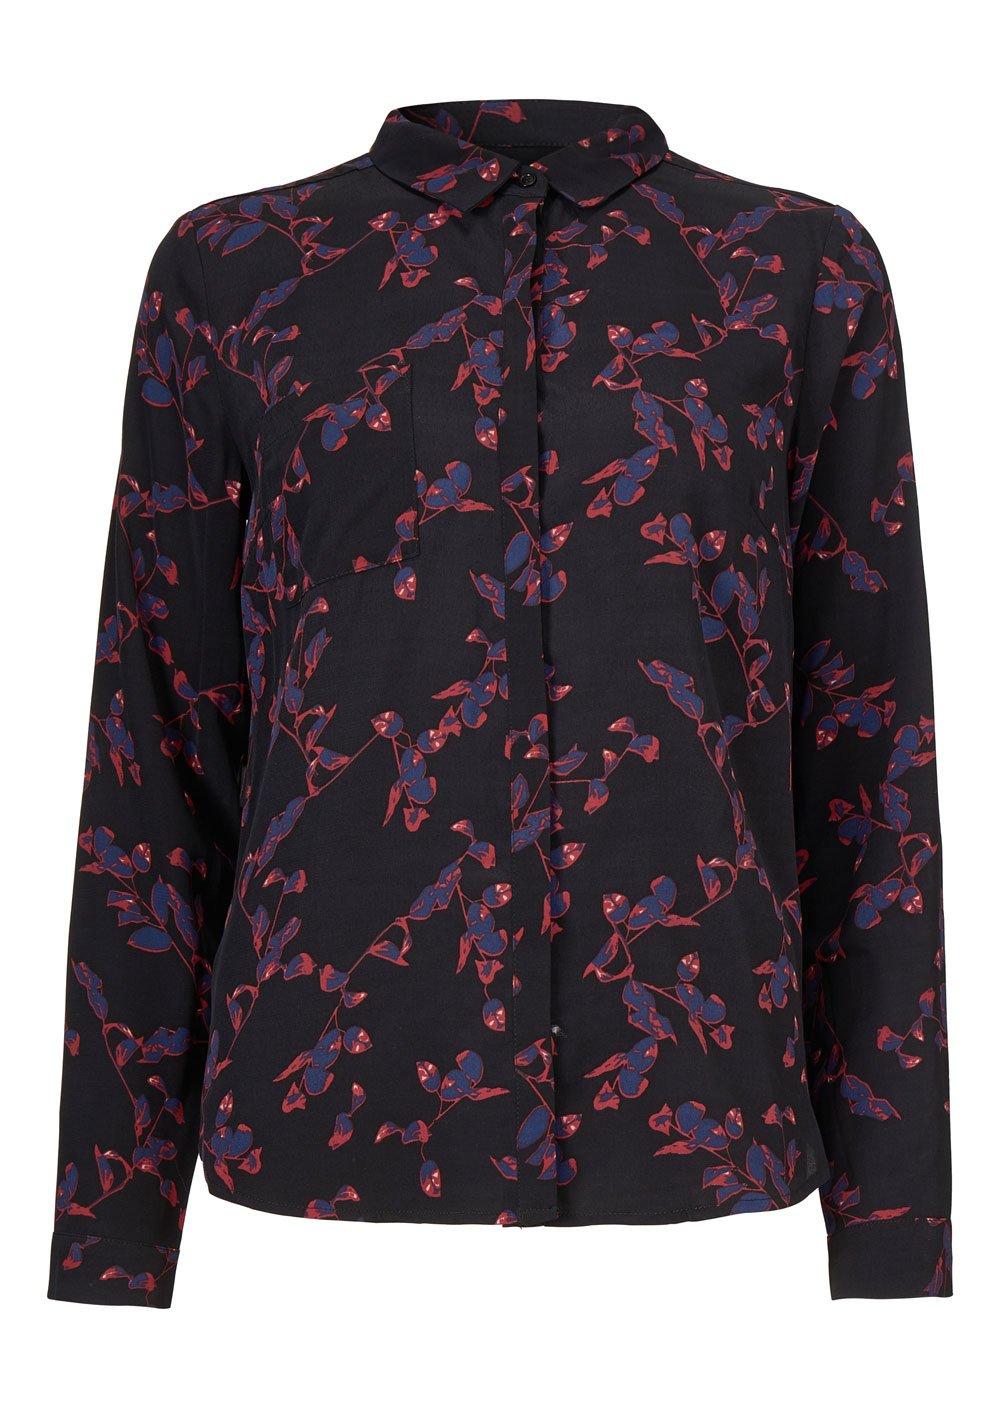 Jesla Print Shirt - Folia